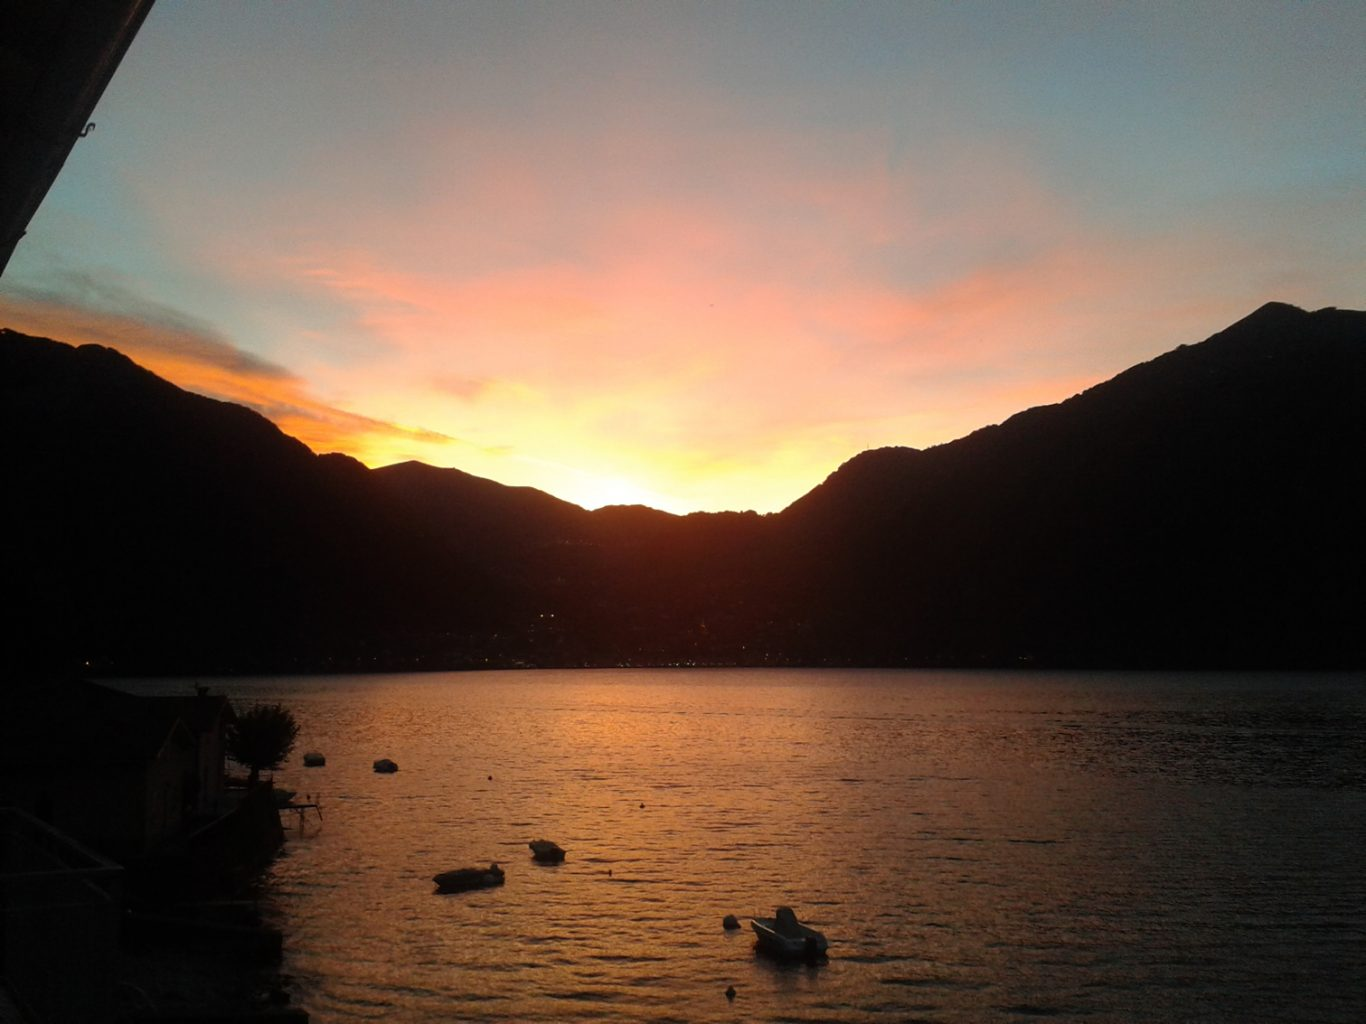 villa verdi sunset view